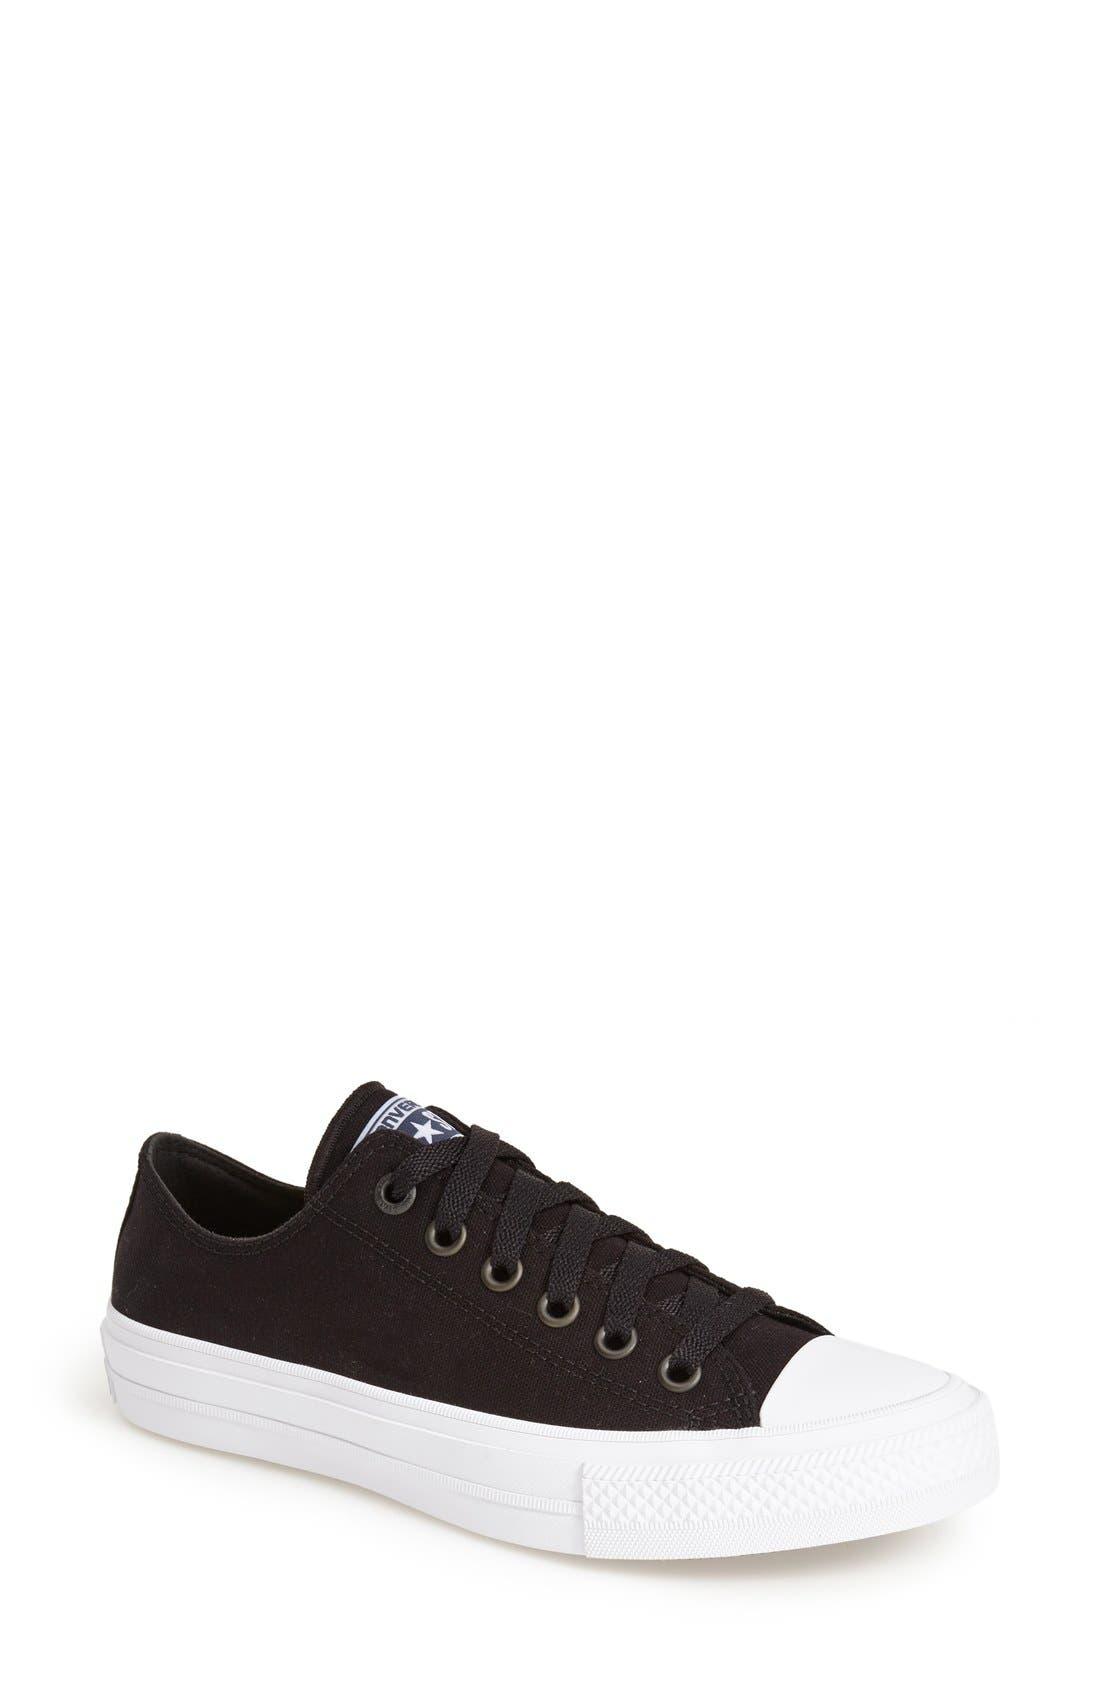 Main Image - Converse Chuck Taylor® All Star® 'Chuck II' Low Top Sneaker (Women)